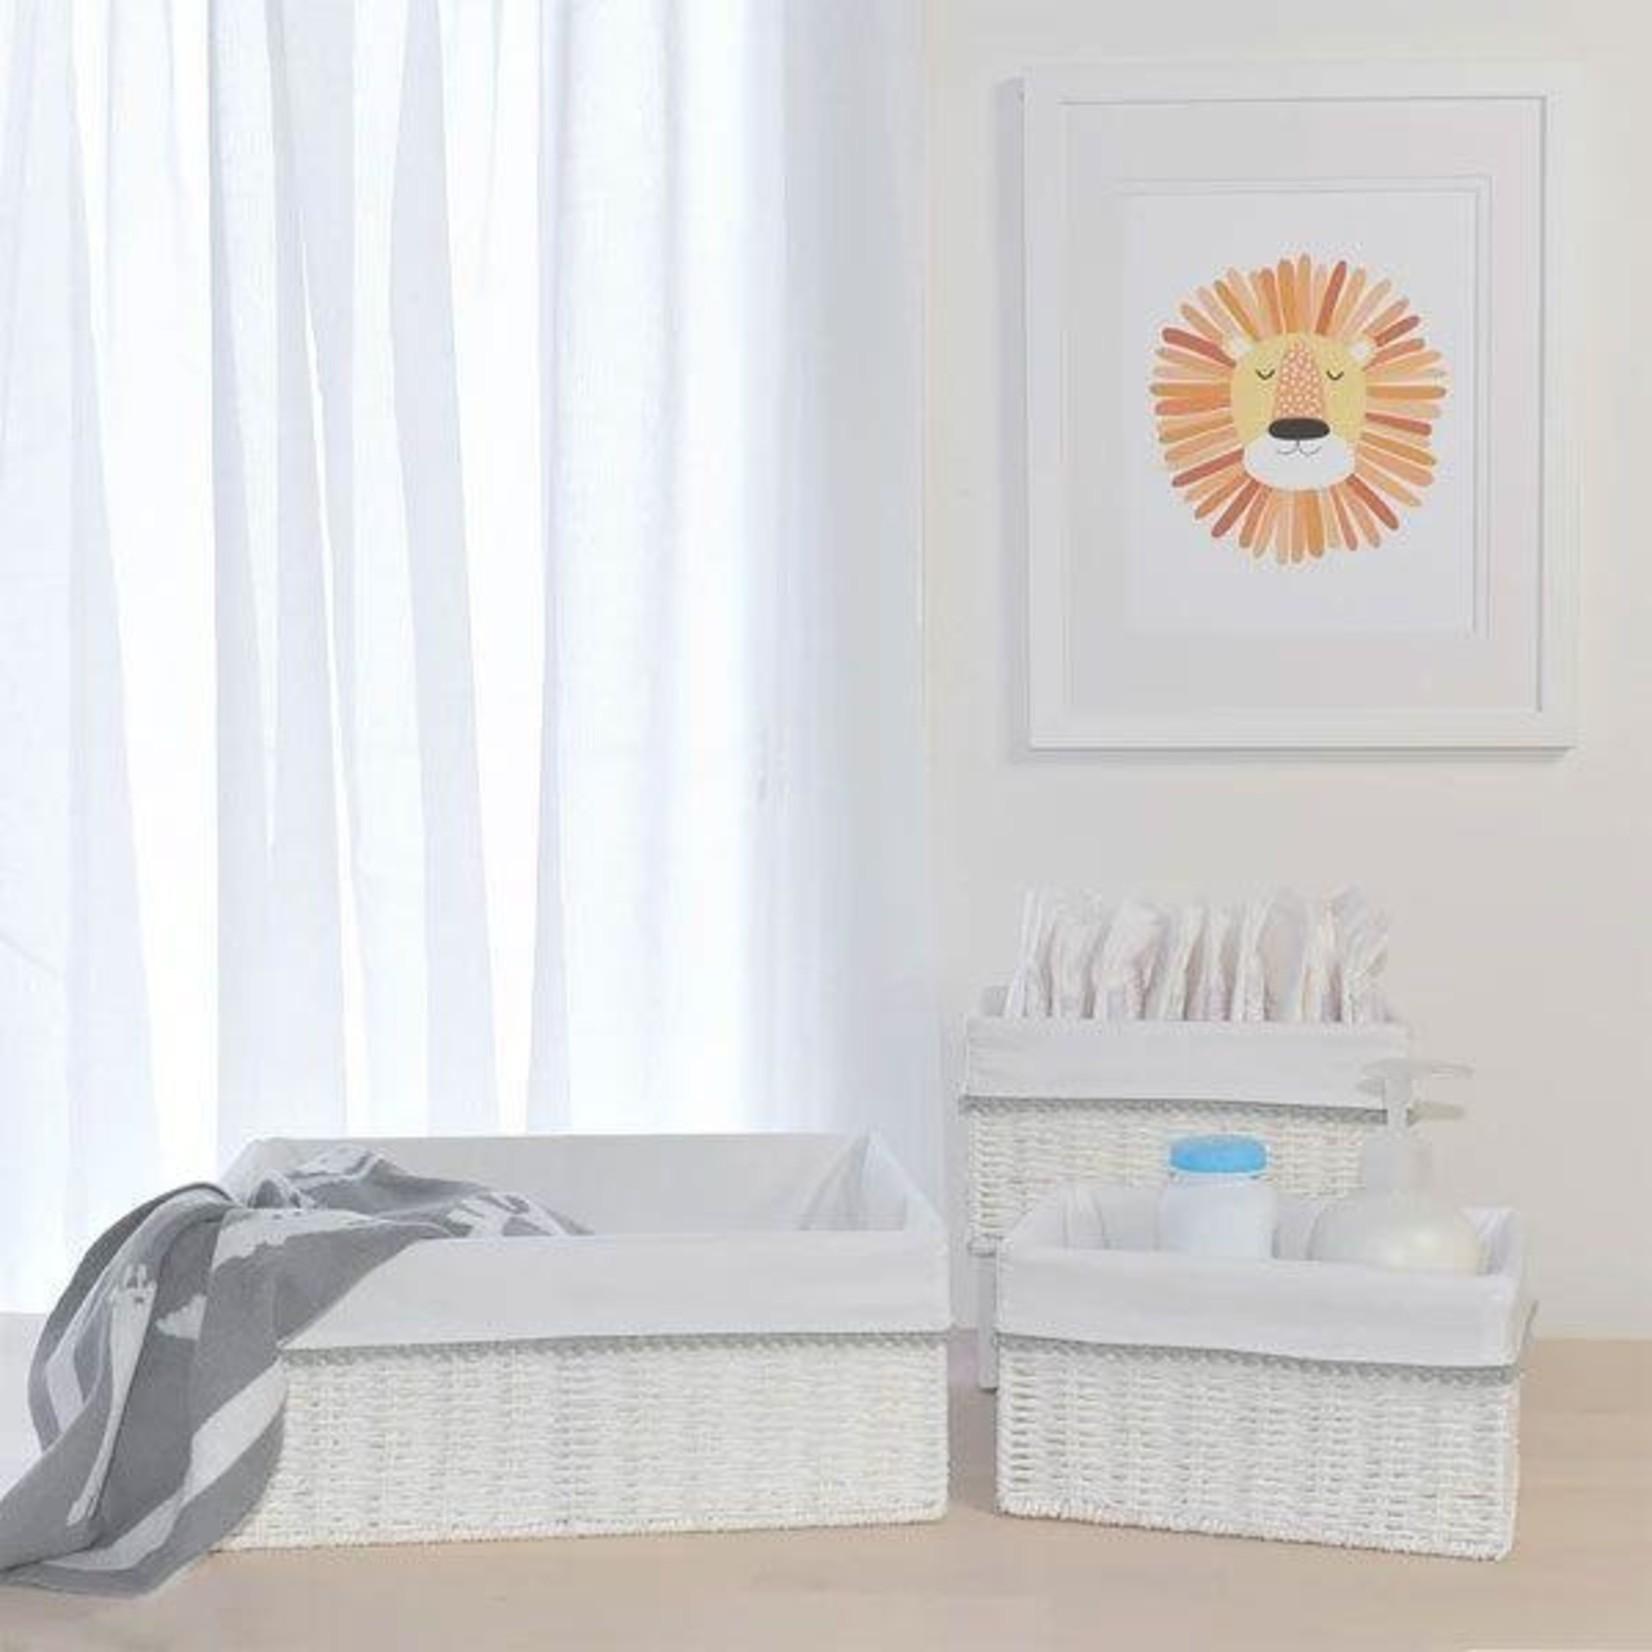 Living Textiles Living Textiles 3 Piece Nursery Set Grey